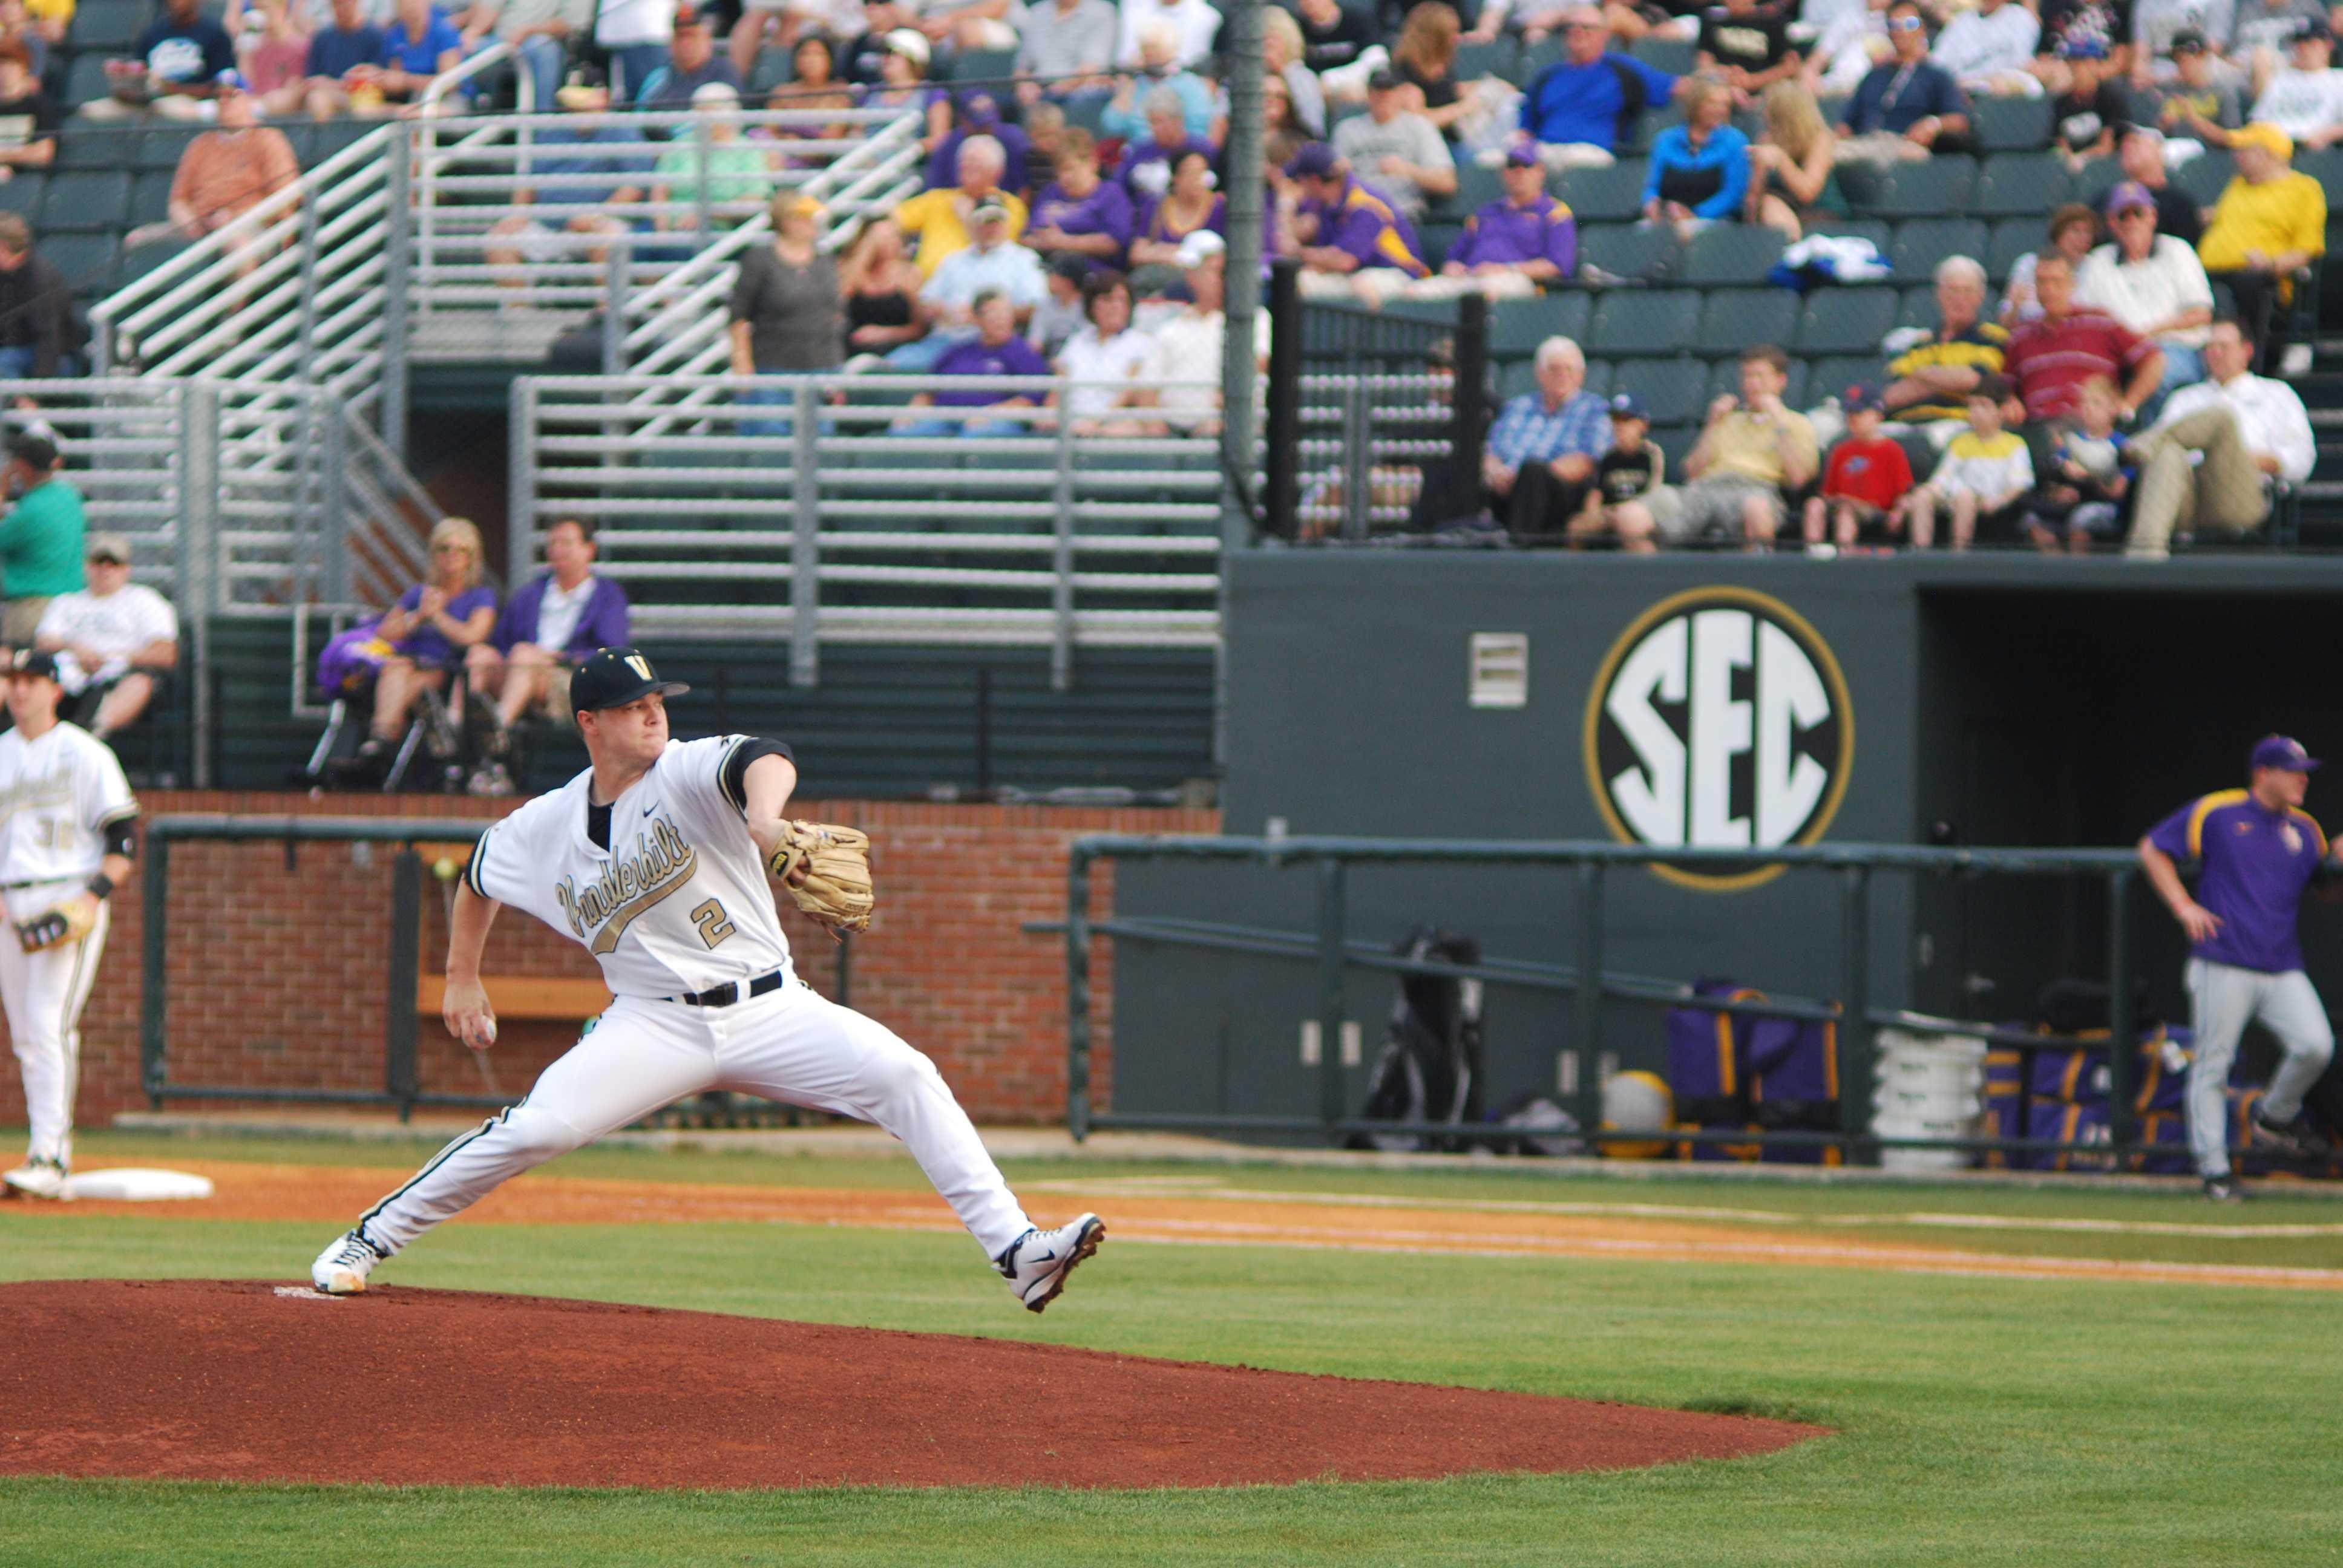 Sonny Gray (2), Vanderbilt baseball vs. LSU, April 22, 2011. Photo by Beck Friedman.